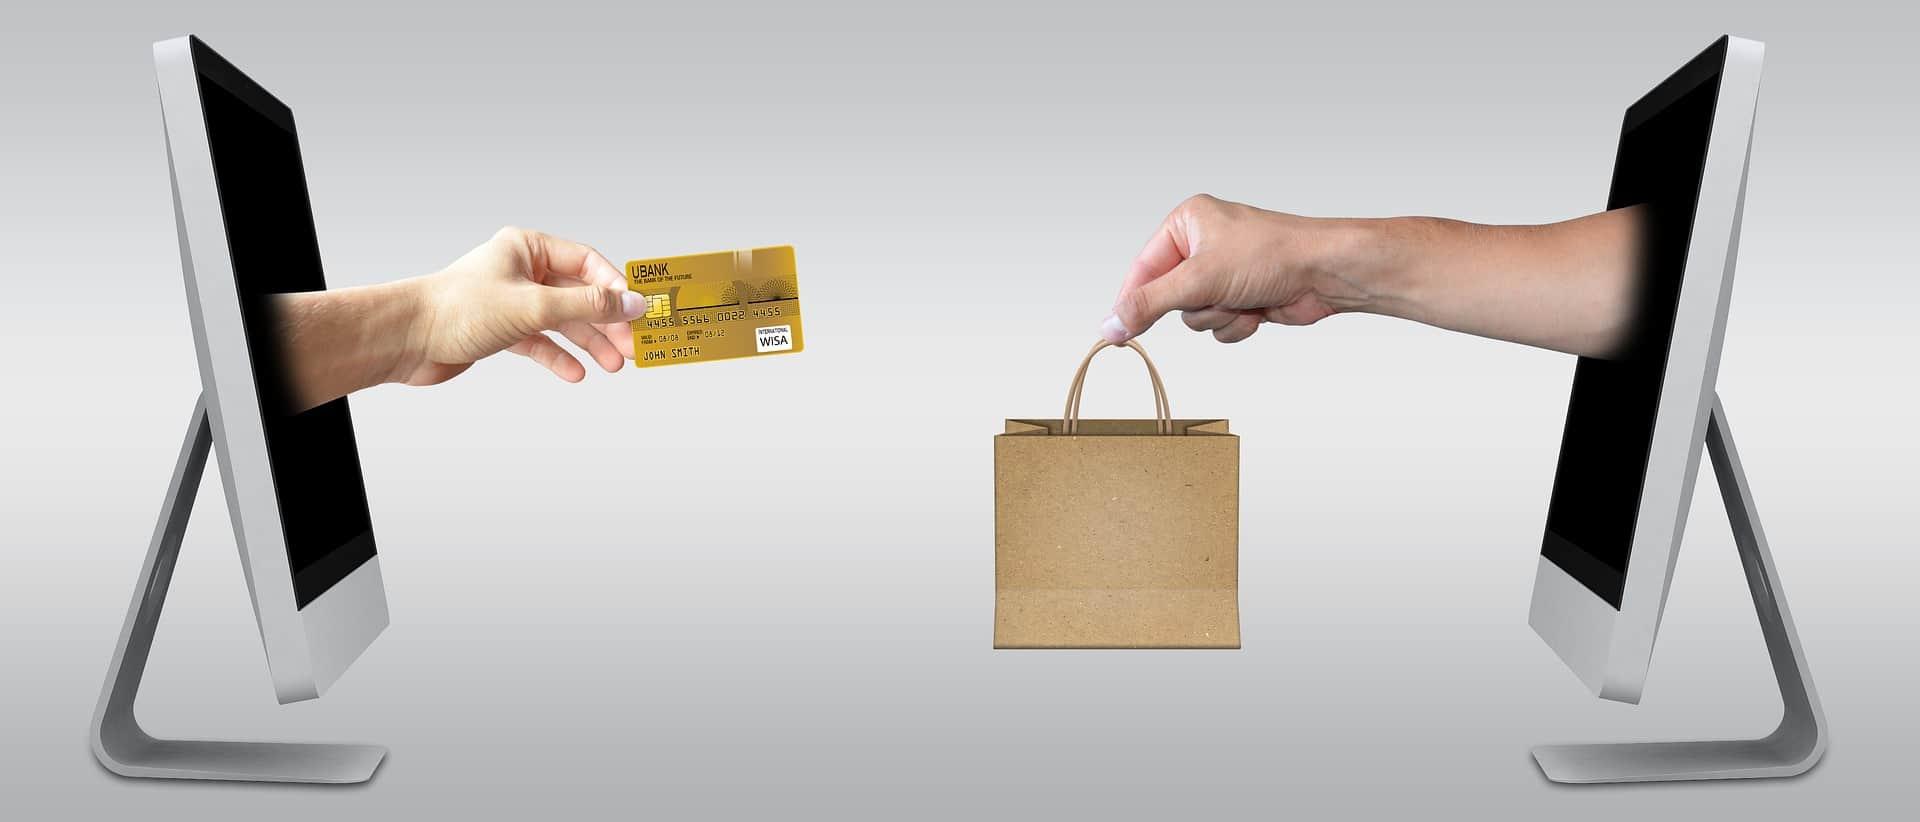 payment wirecard woocommerce plugin lösung